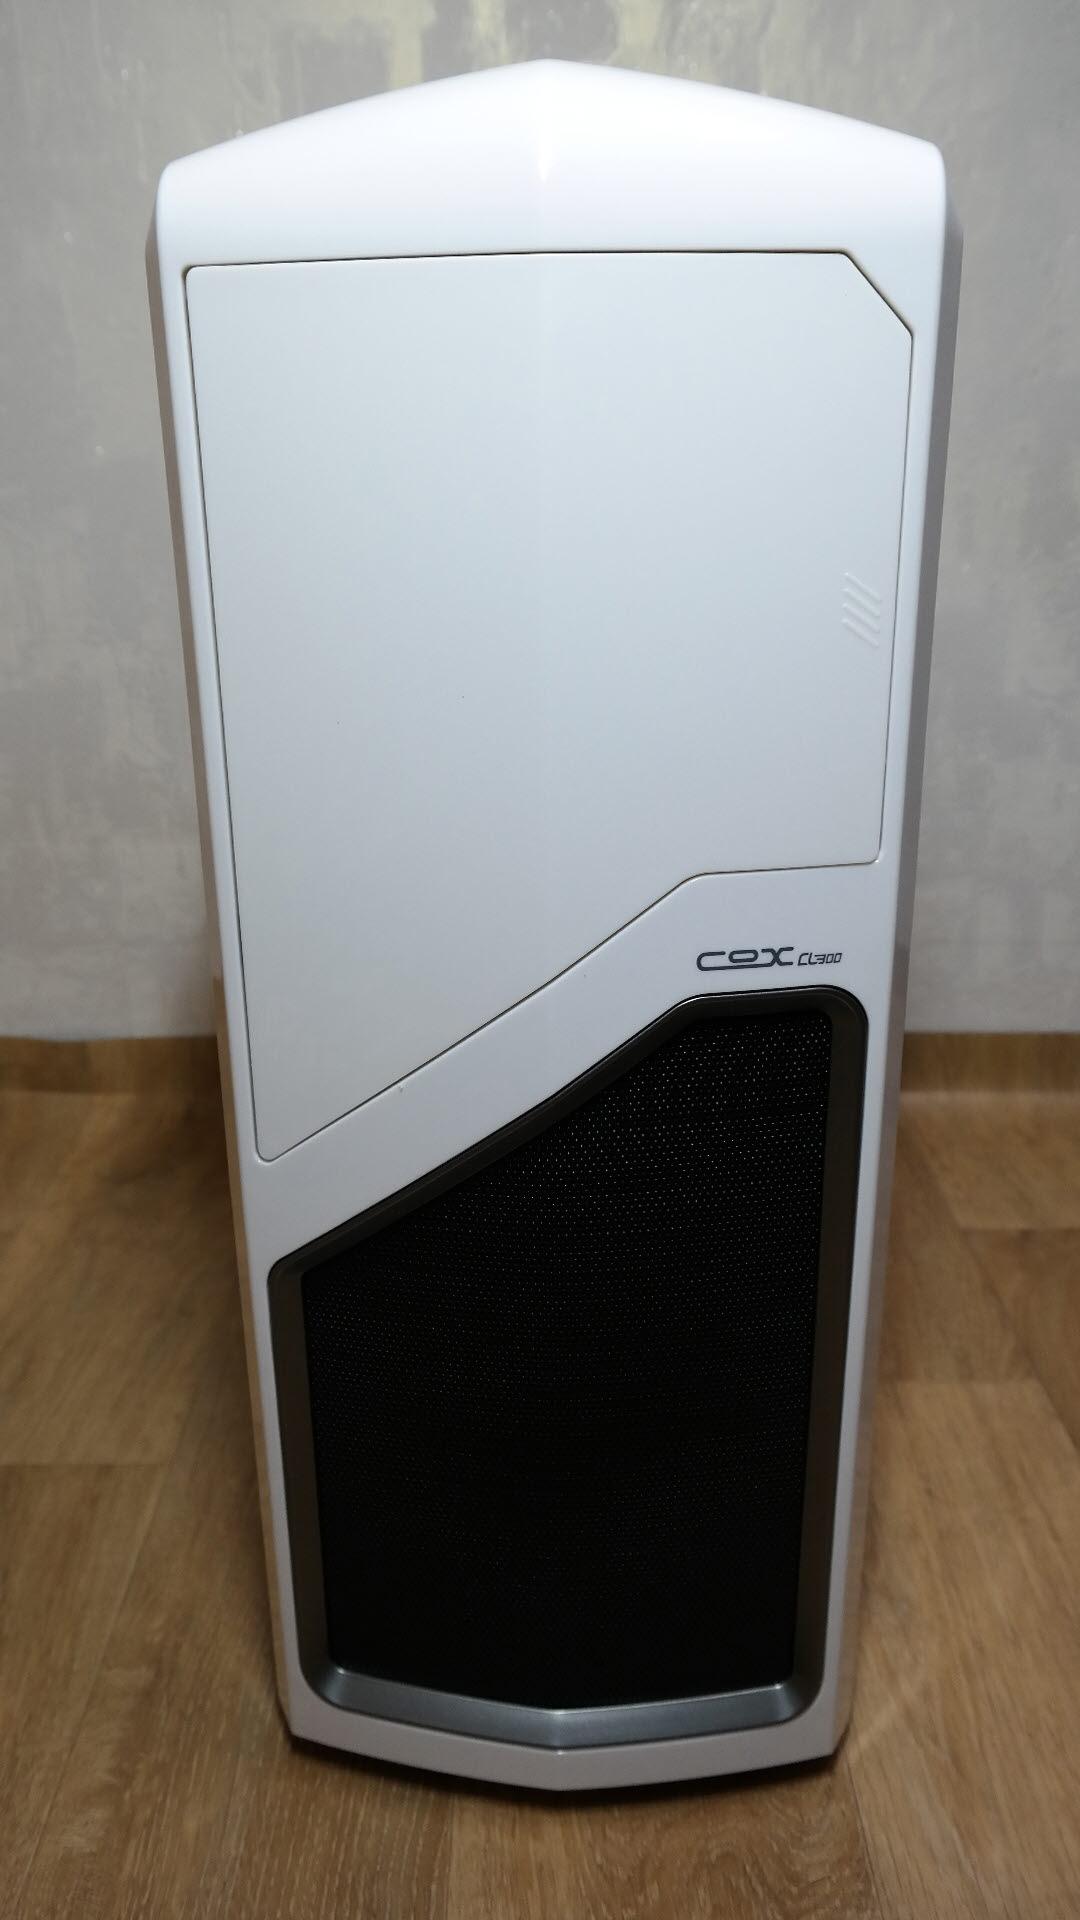 �Ƹ��ٿ� �����ΰ� ȭ��Ʈ �÷��� ȯ������ �ݶ� �����ߴ�! COX CL300 USB3.0 ȭ��Ʈ